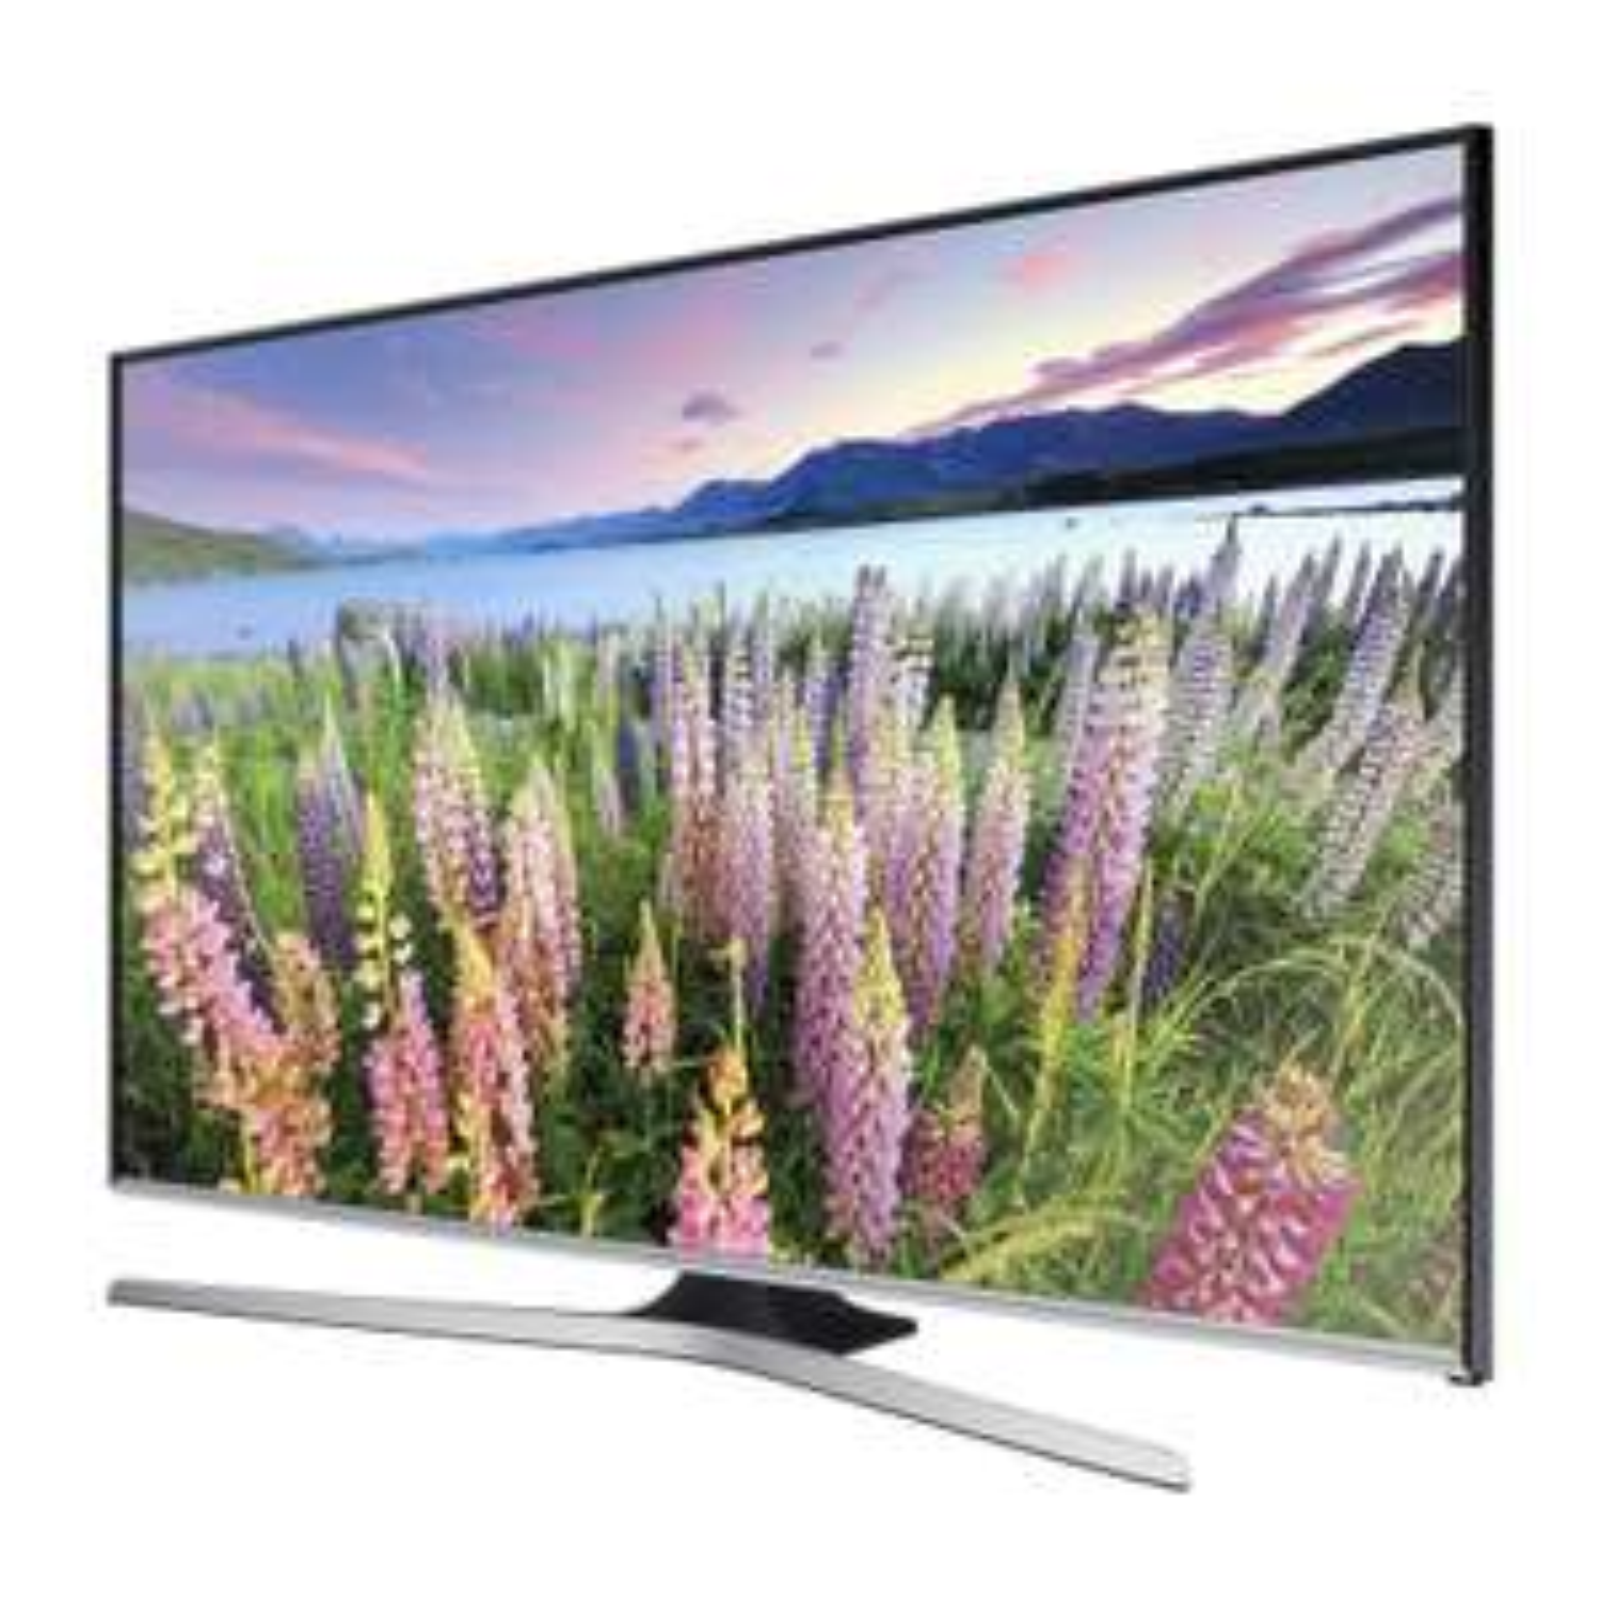 "Téléviseur 48"" Samsung 48J5500 - Full HD - 400 Hz PQI - TV connectée"